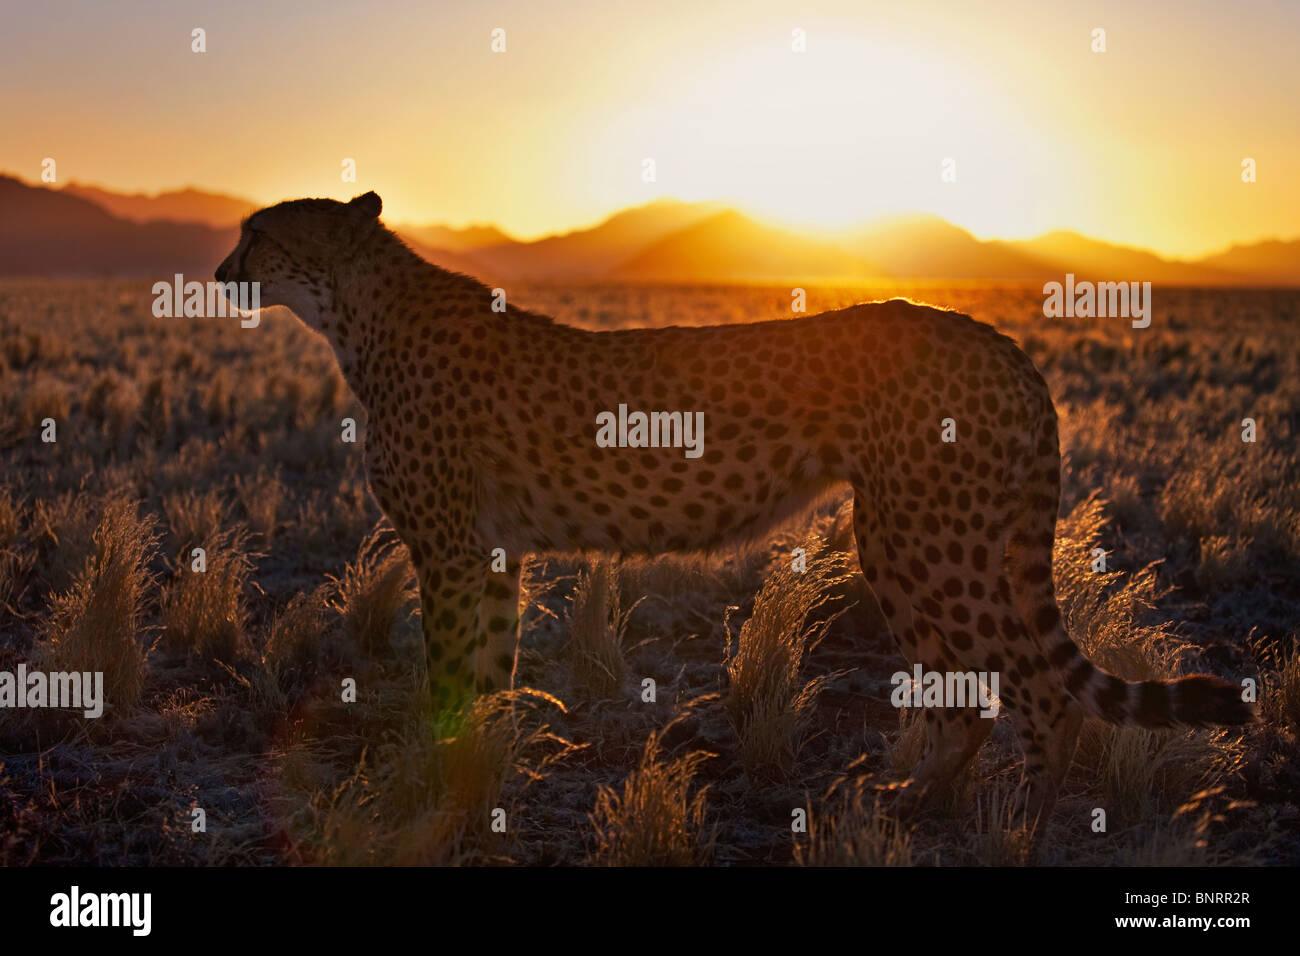 Cheetah (Acinonyx jubatus)in silhouette standing in desert habitat at sunset. Namib desert Namibia - Stock Image